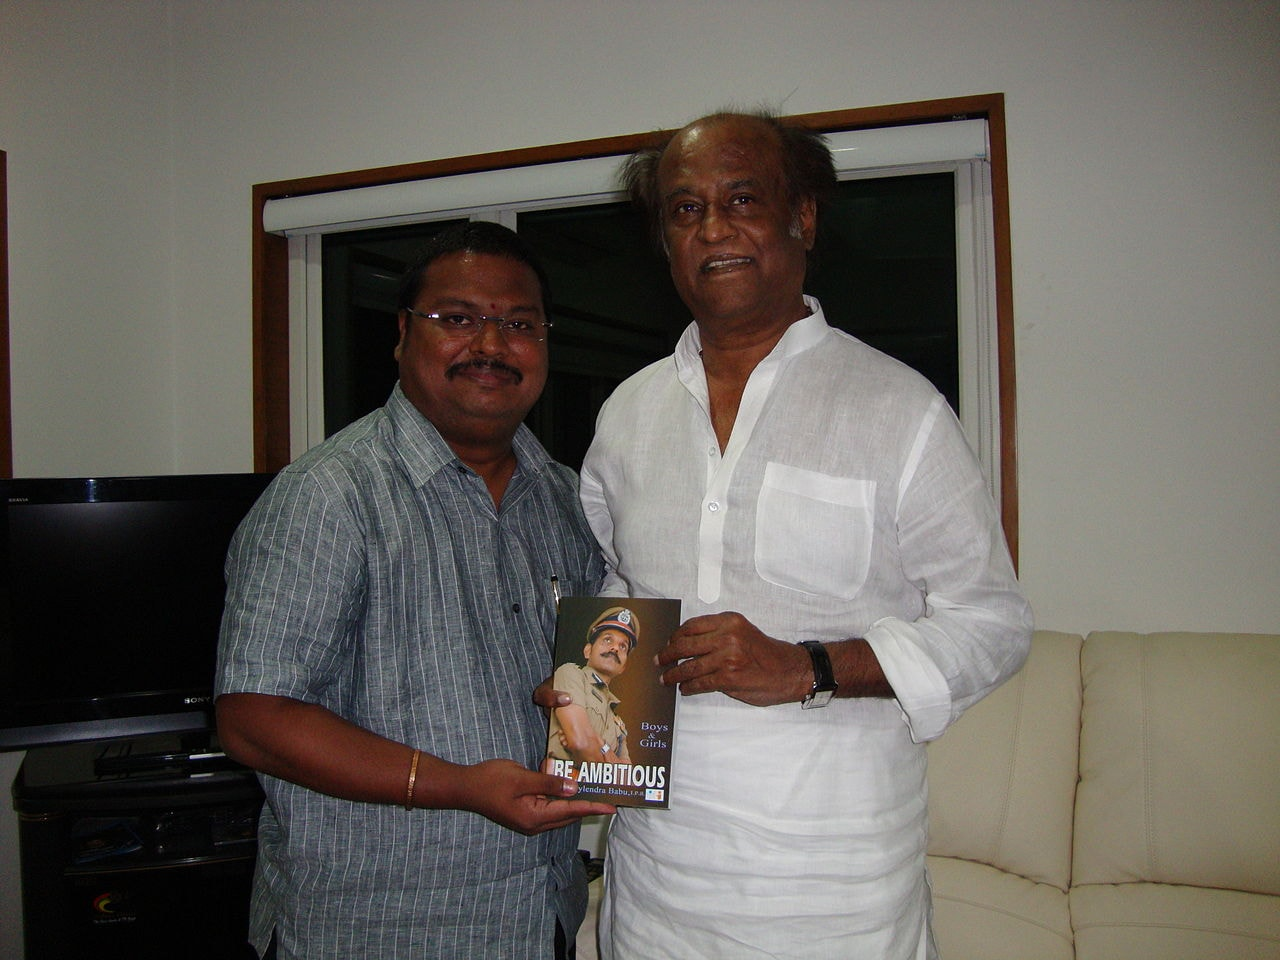 1280px-Suresh_Prthasarathy_with_rajinikanth_sir